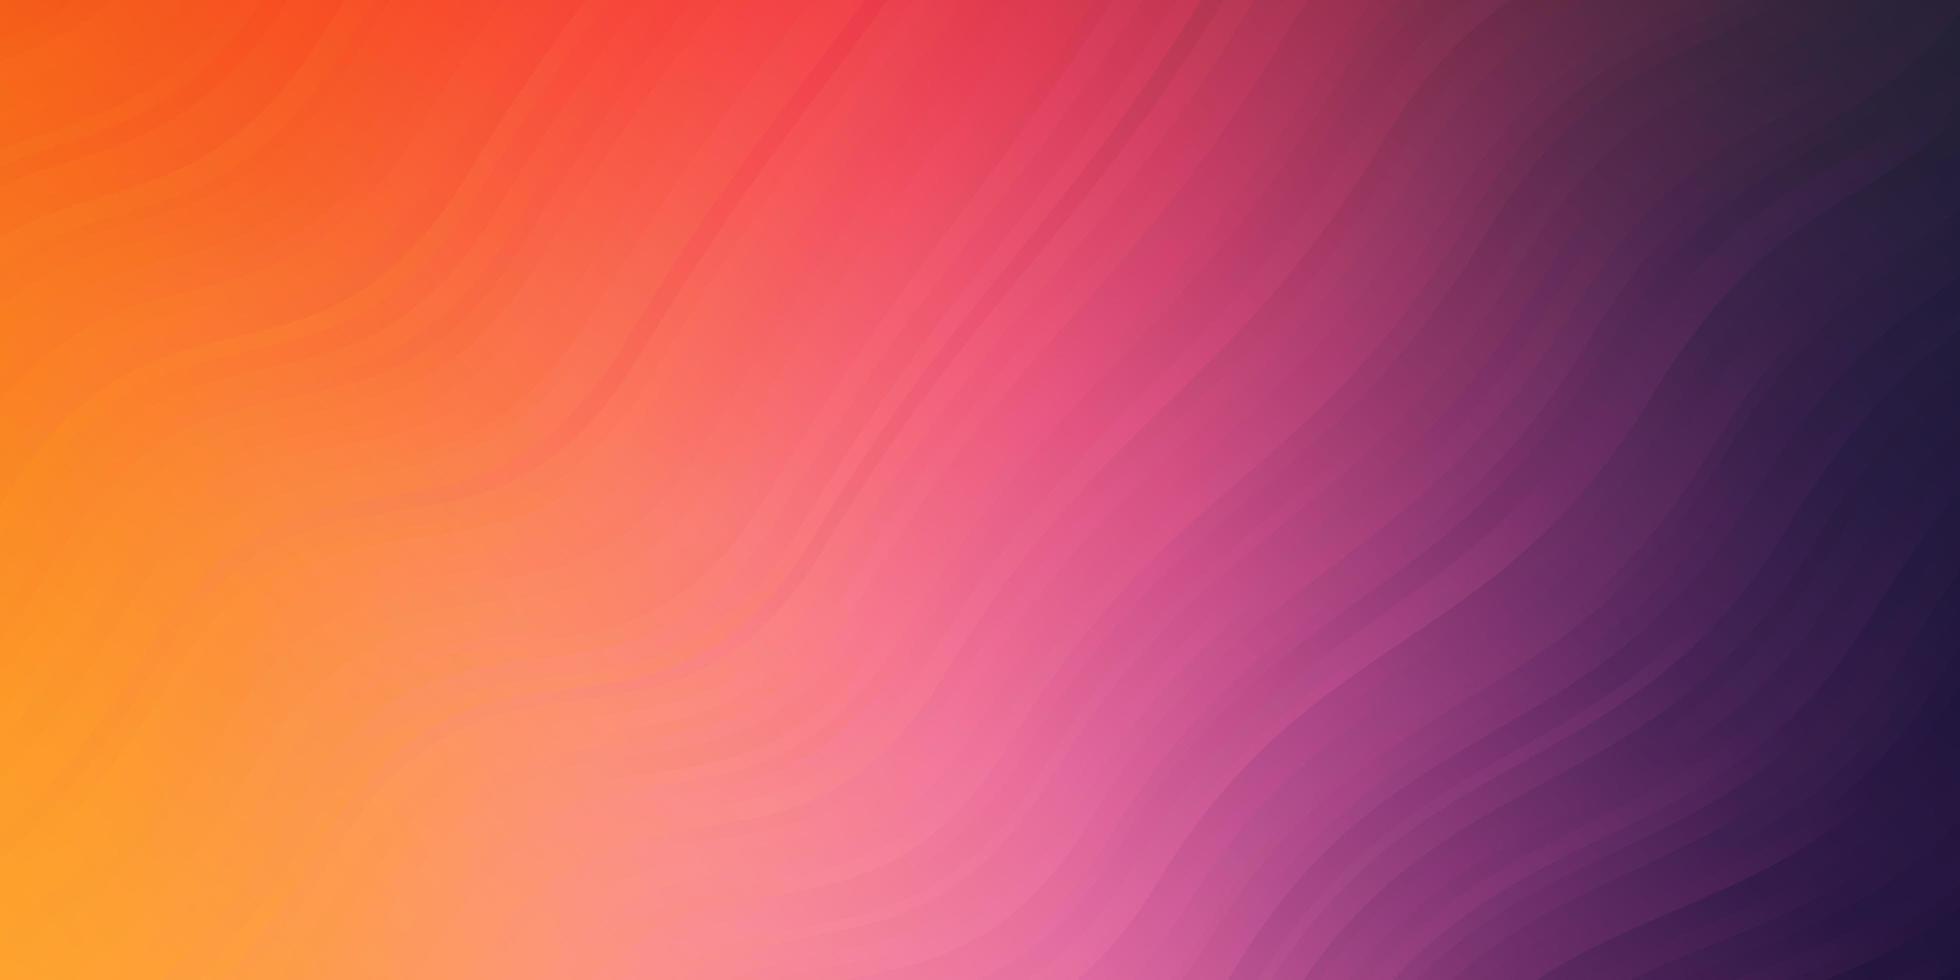 hellrosa, gelbe Vektorbeschaffenheit mit Kurven. vektor